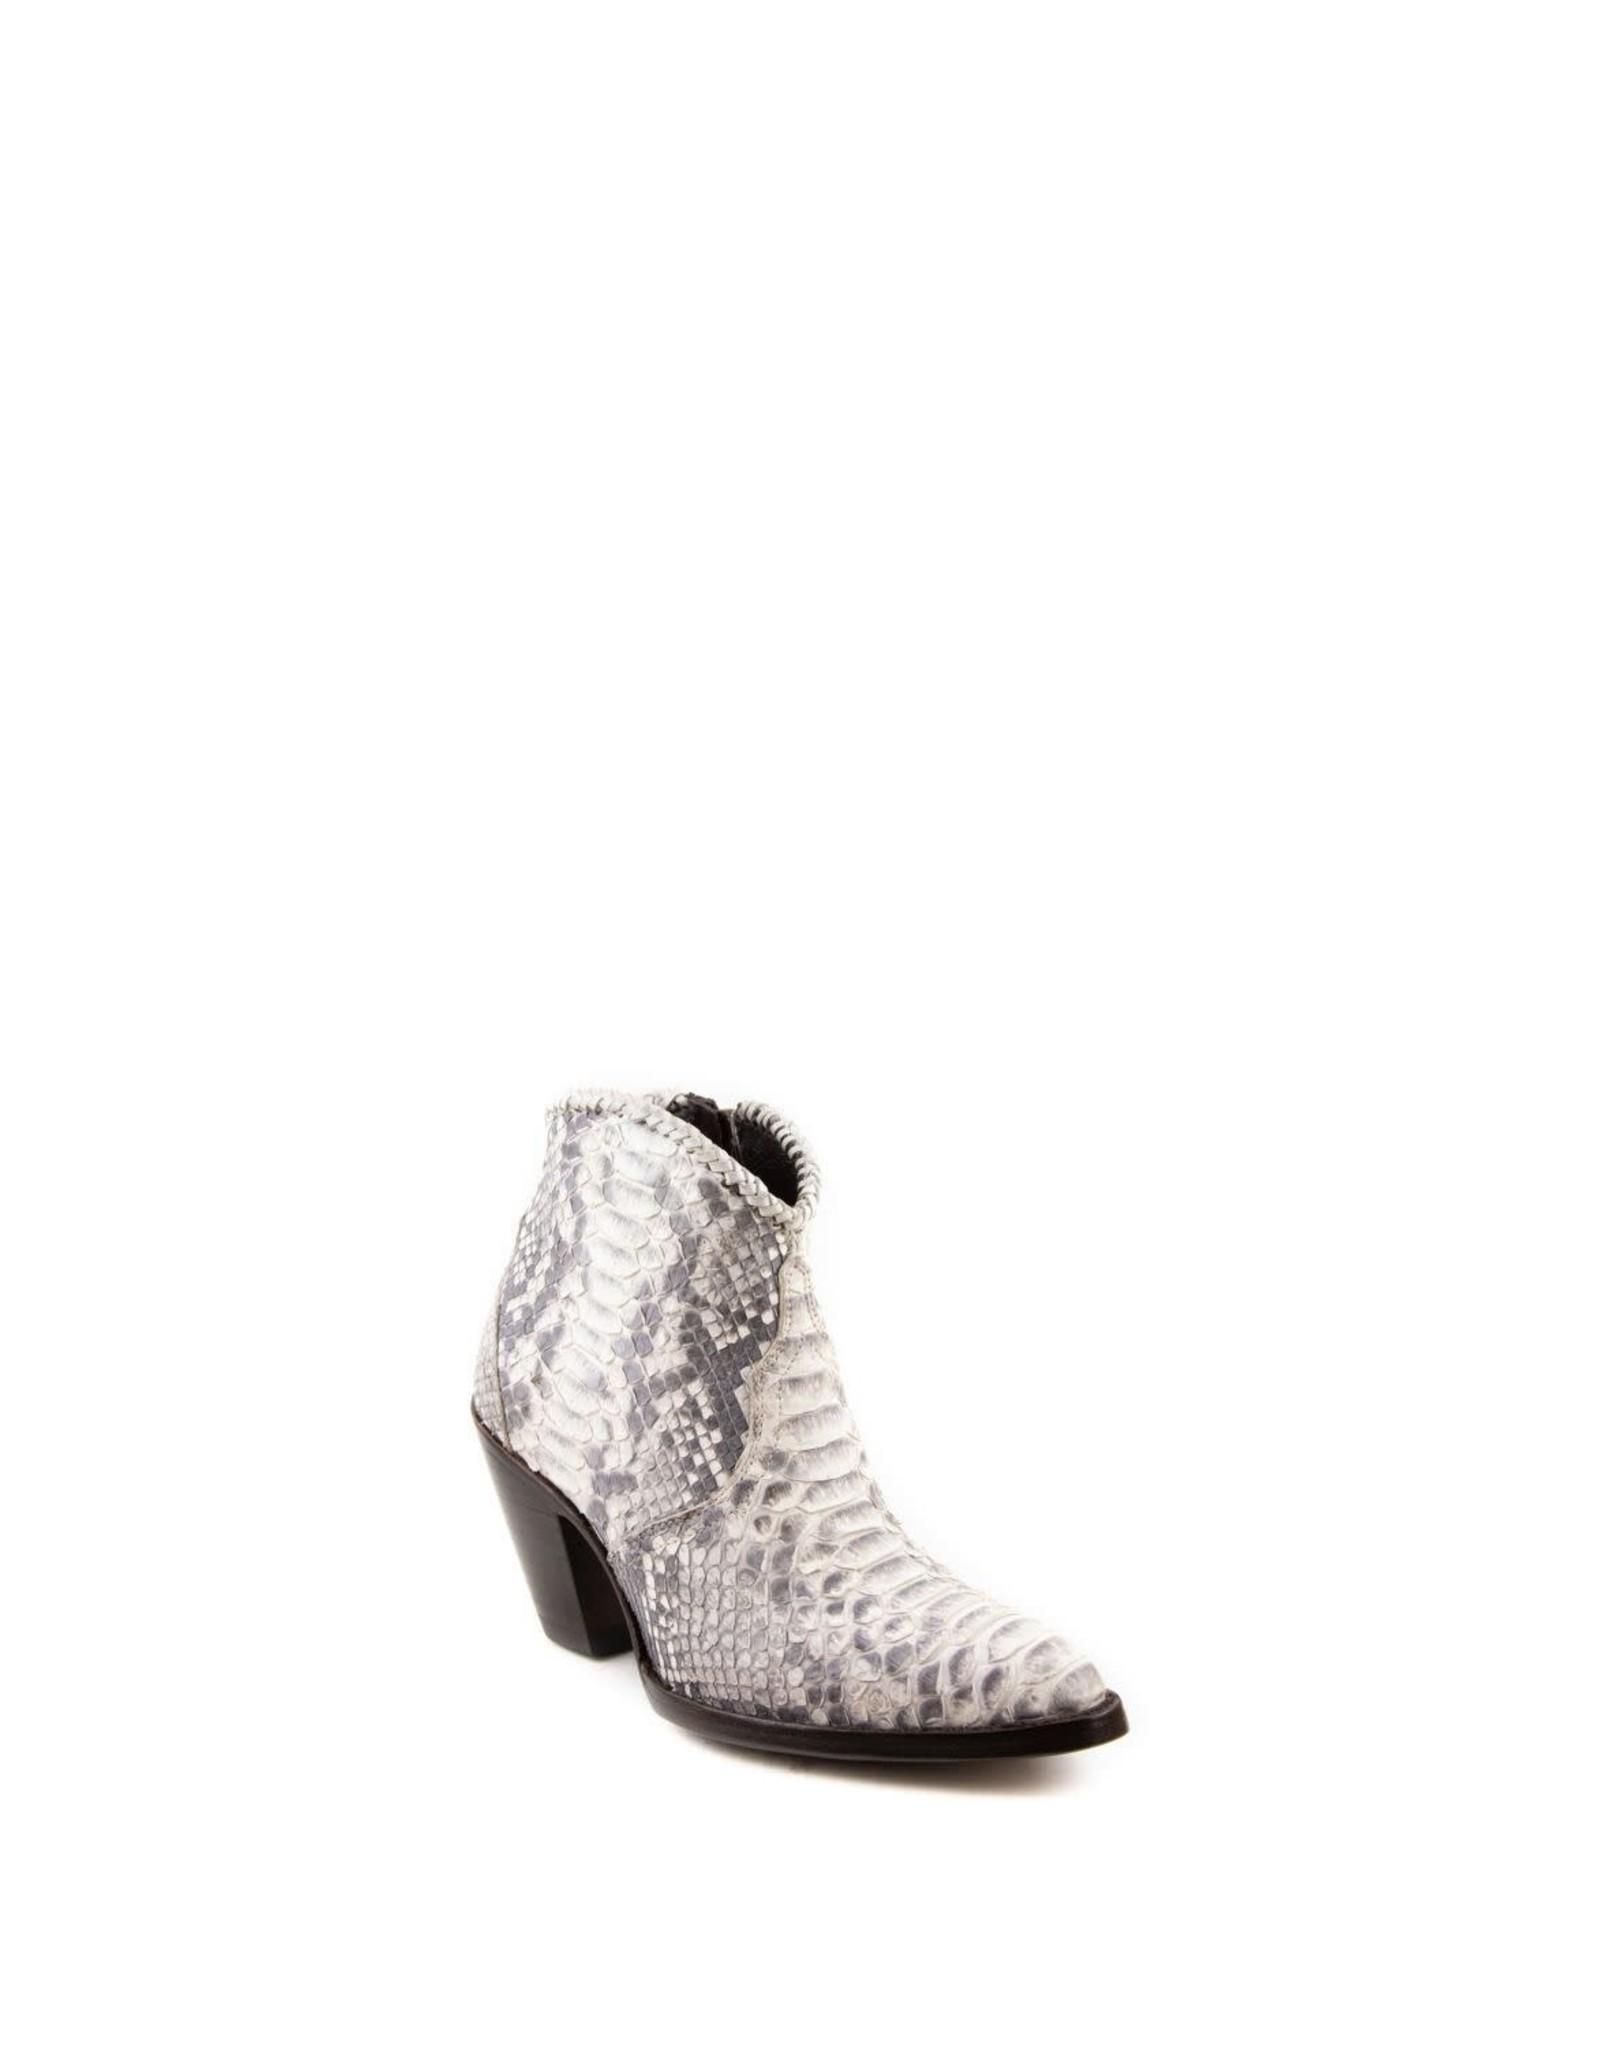 Allen's Boots Python White/Gray